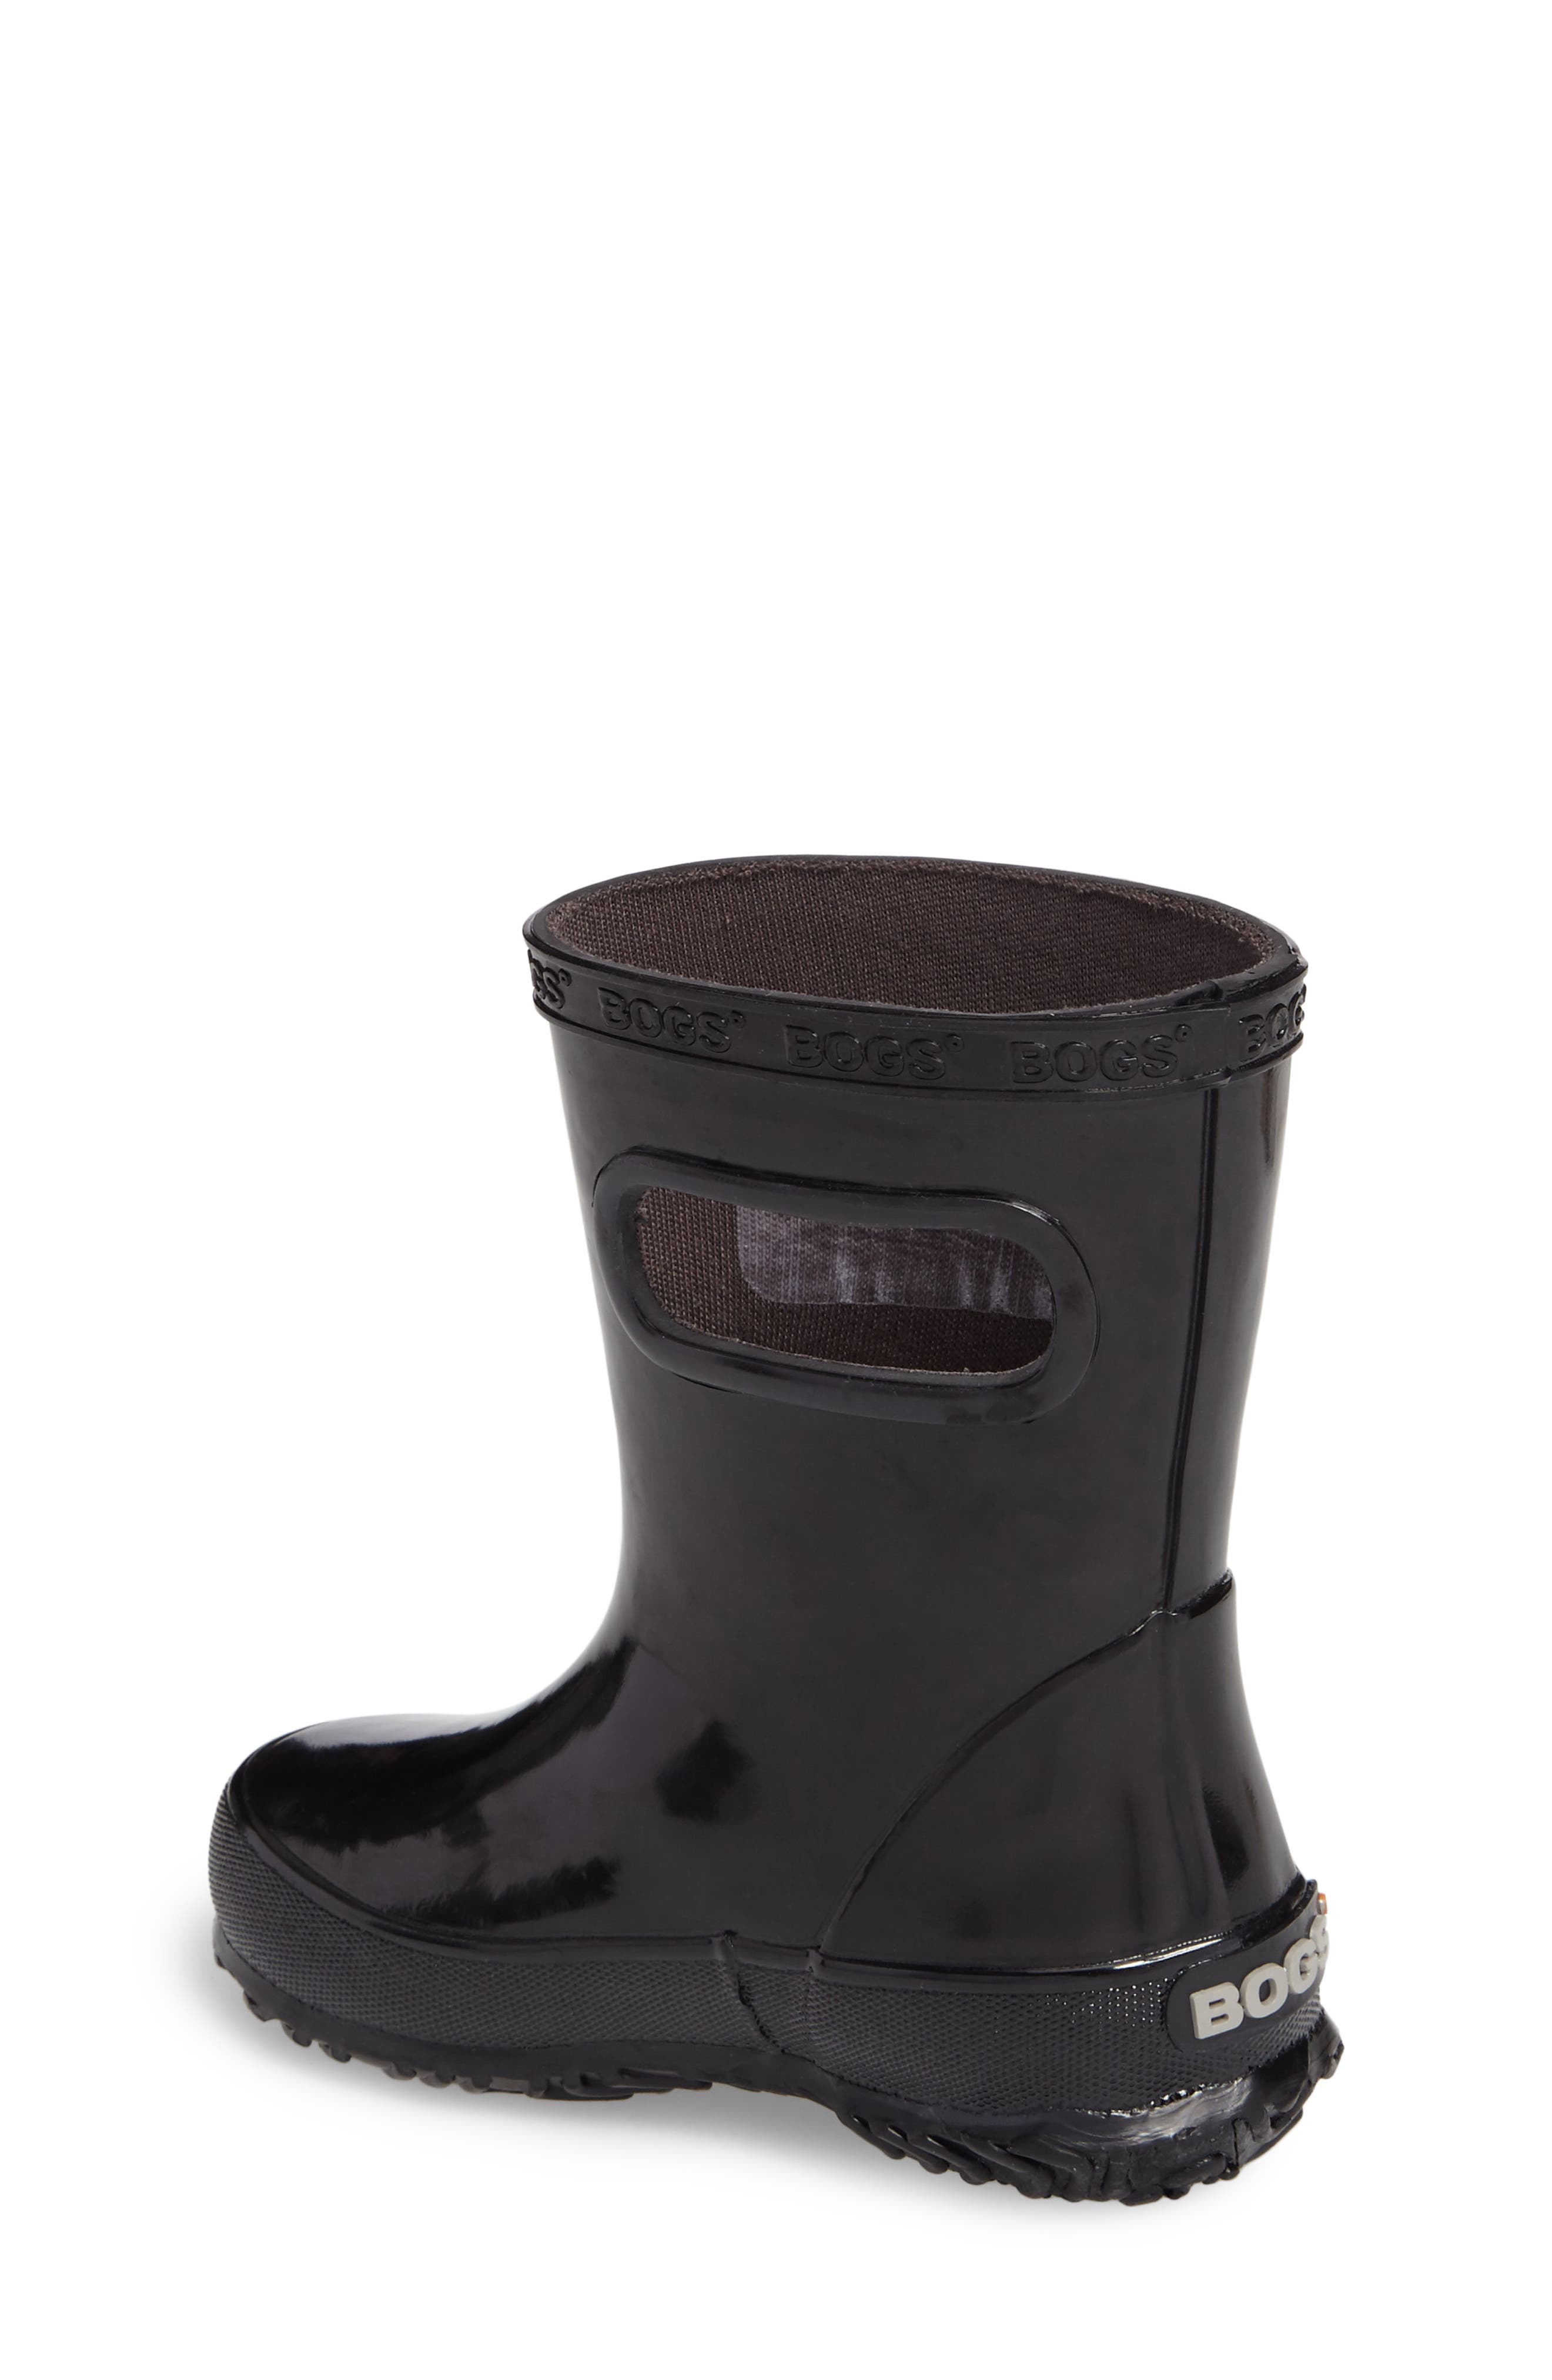 Skipper Rubber Rain Boot,                             Alternate thumbnail 2, color,                             Black